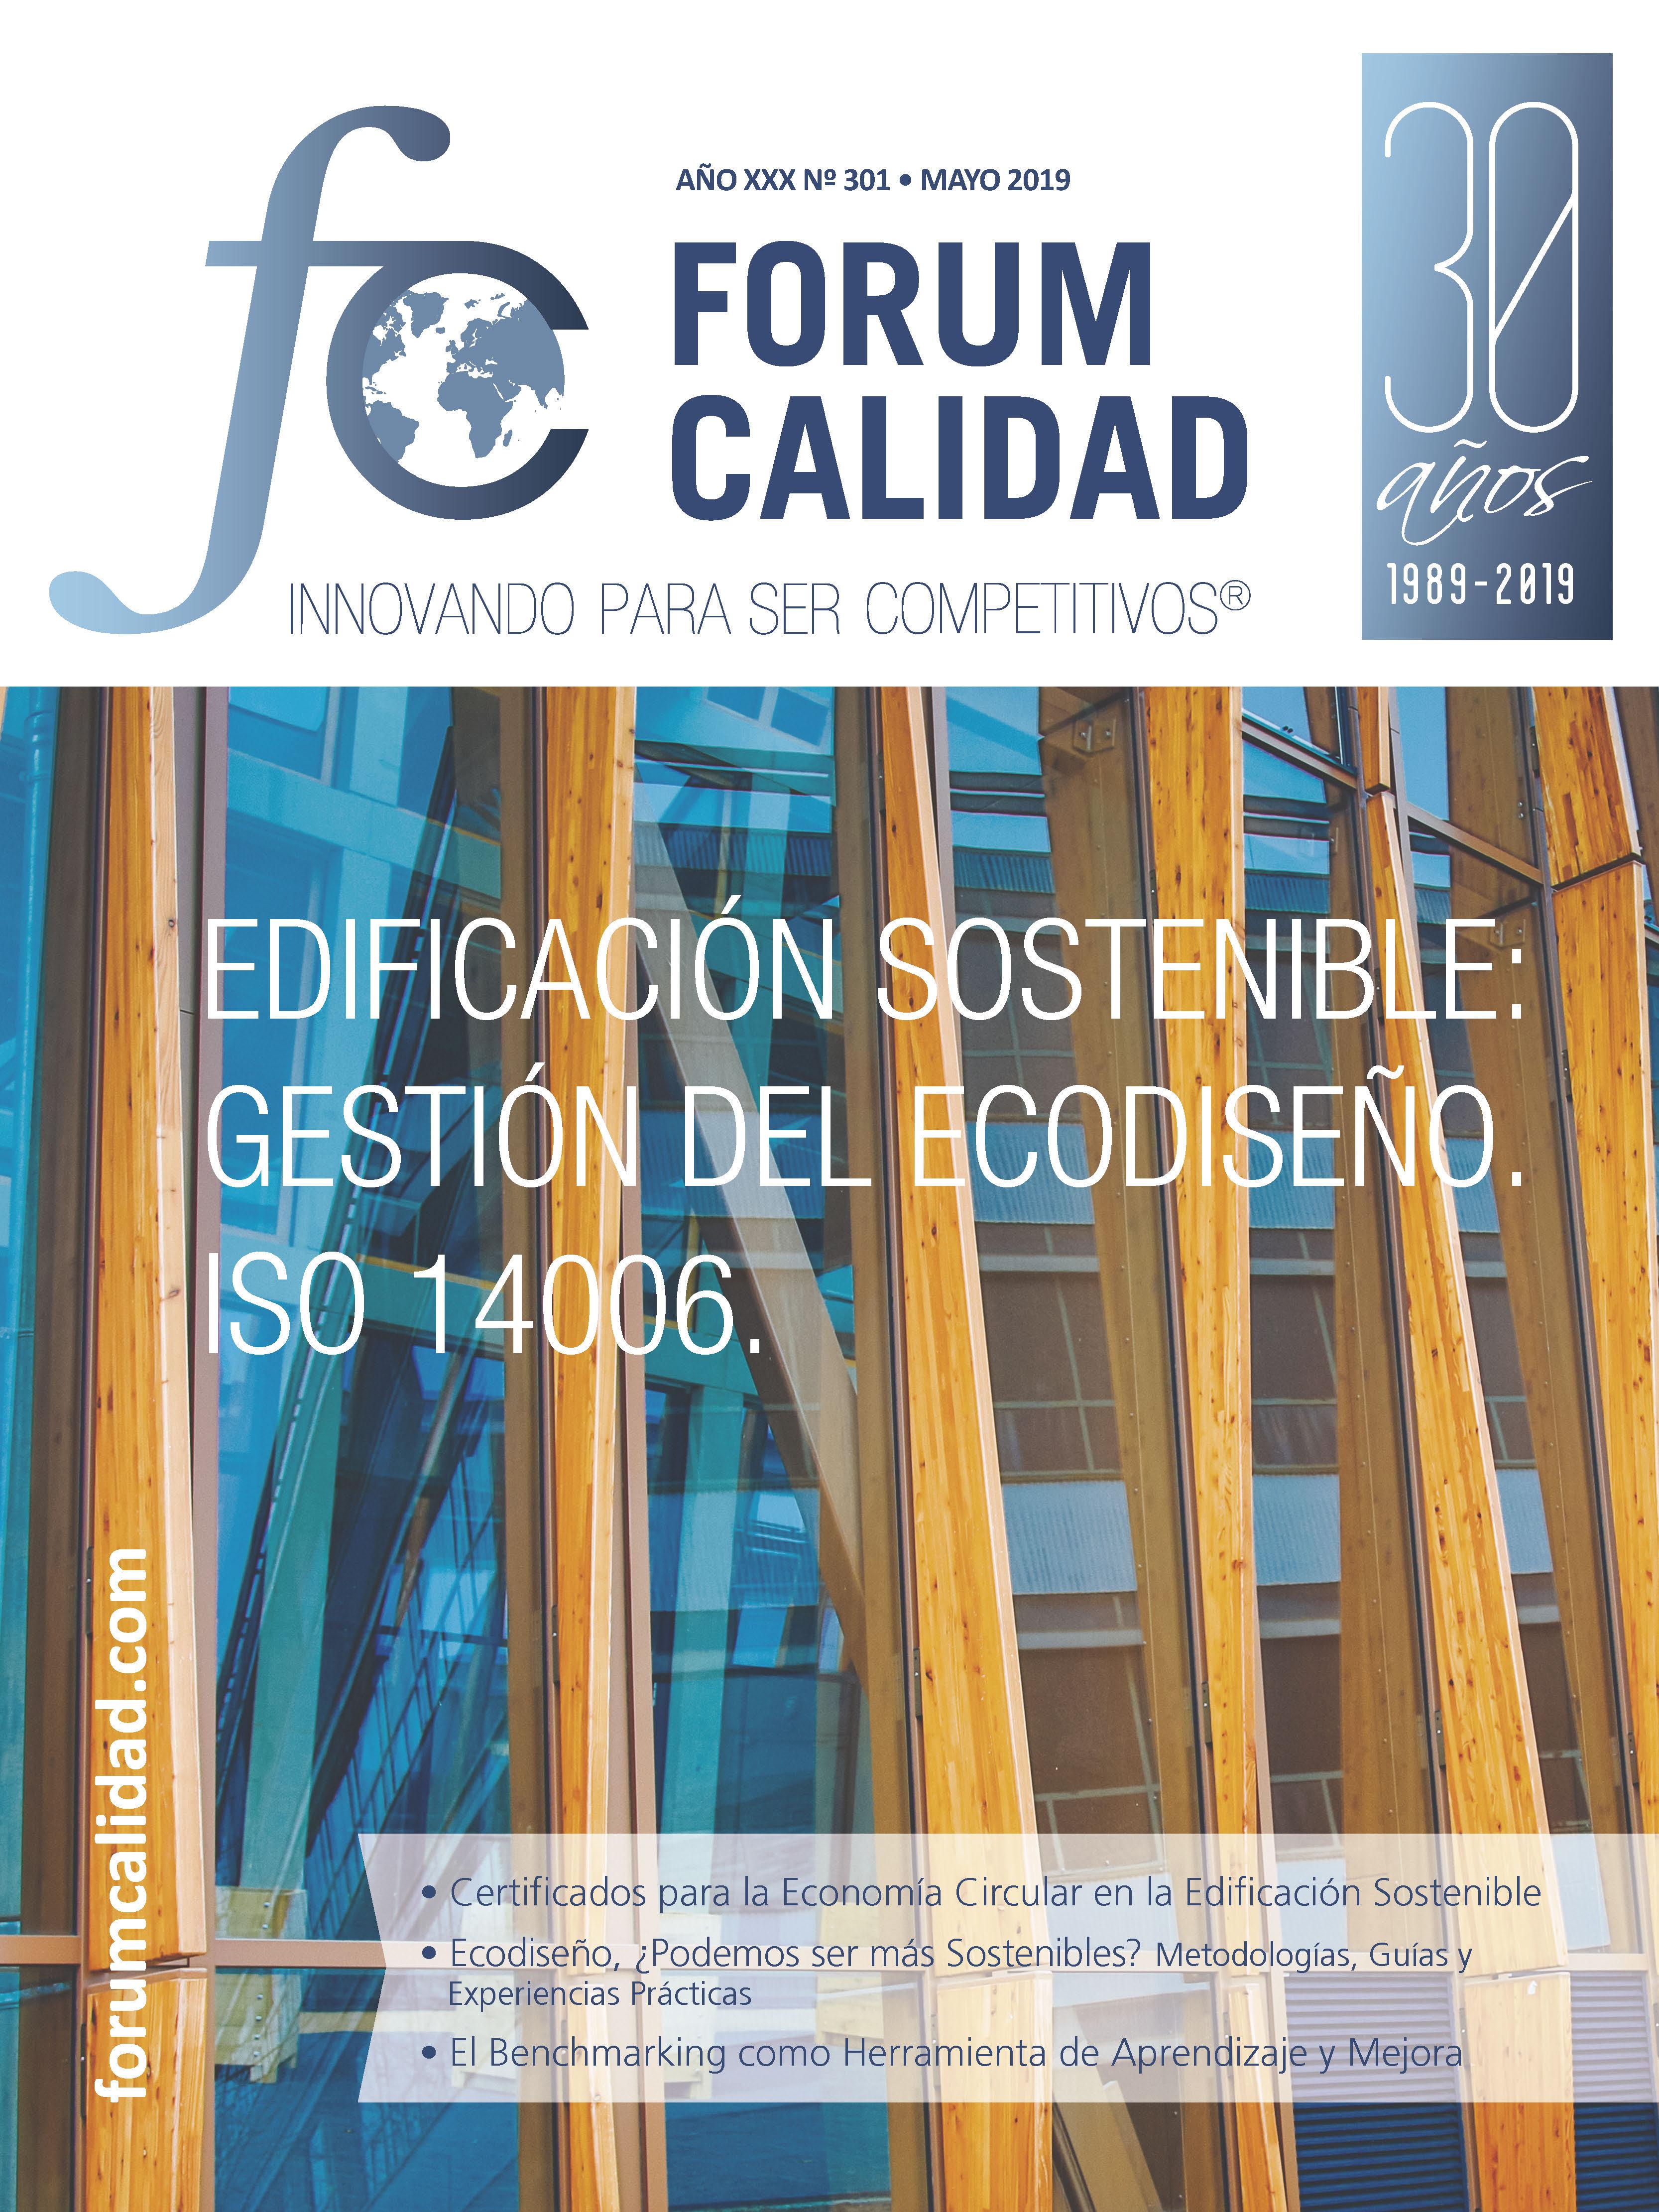 Forum Calidad nº 301 Mayo 2019